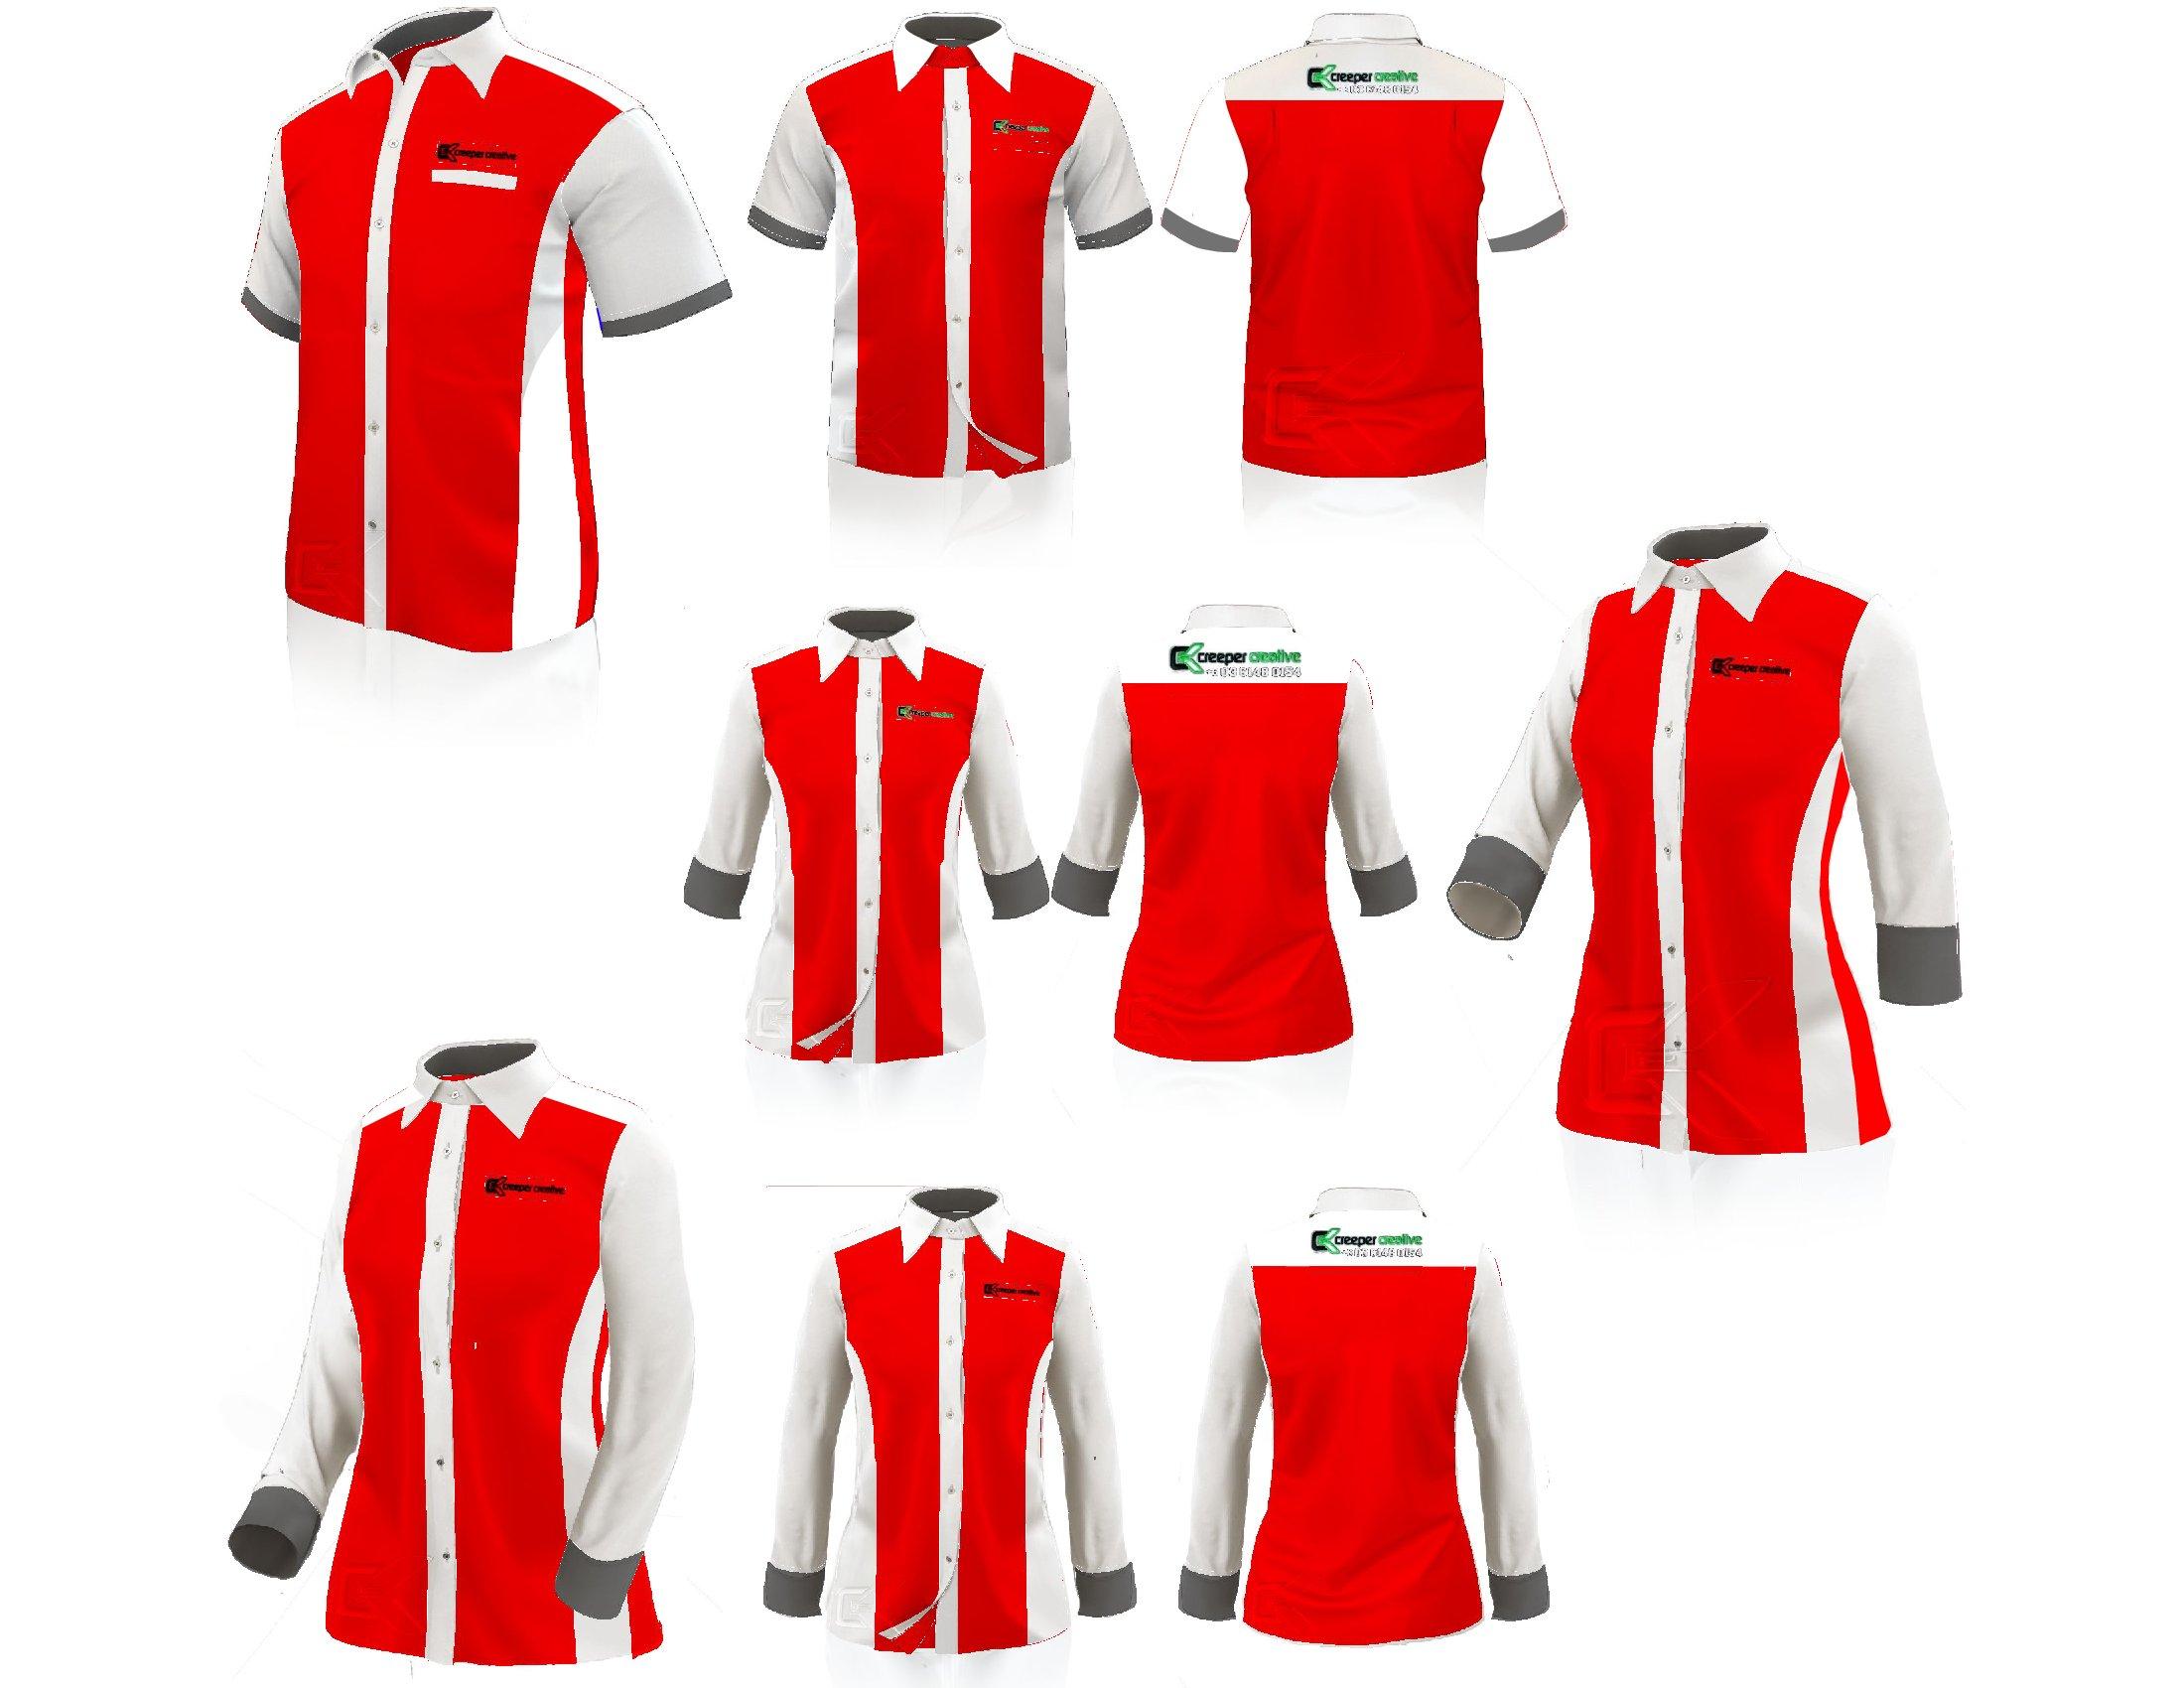 Design t shirt murah - Baju Korporat Design Baju Korporat Muslimah Design Baju Korporat Wanita Baju Korporat Murah Baju Korporat Terkini Baju Korporat Ready Made Design Baju Kor